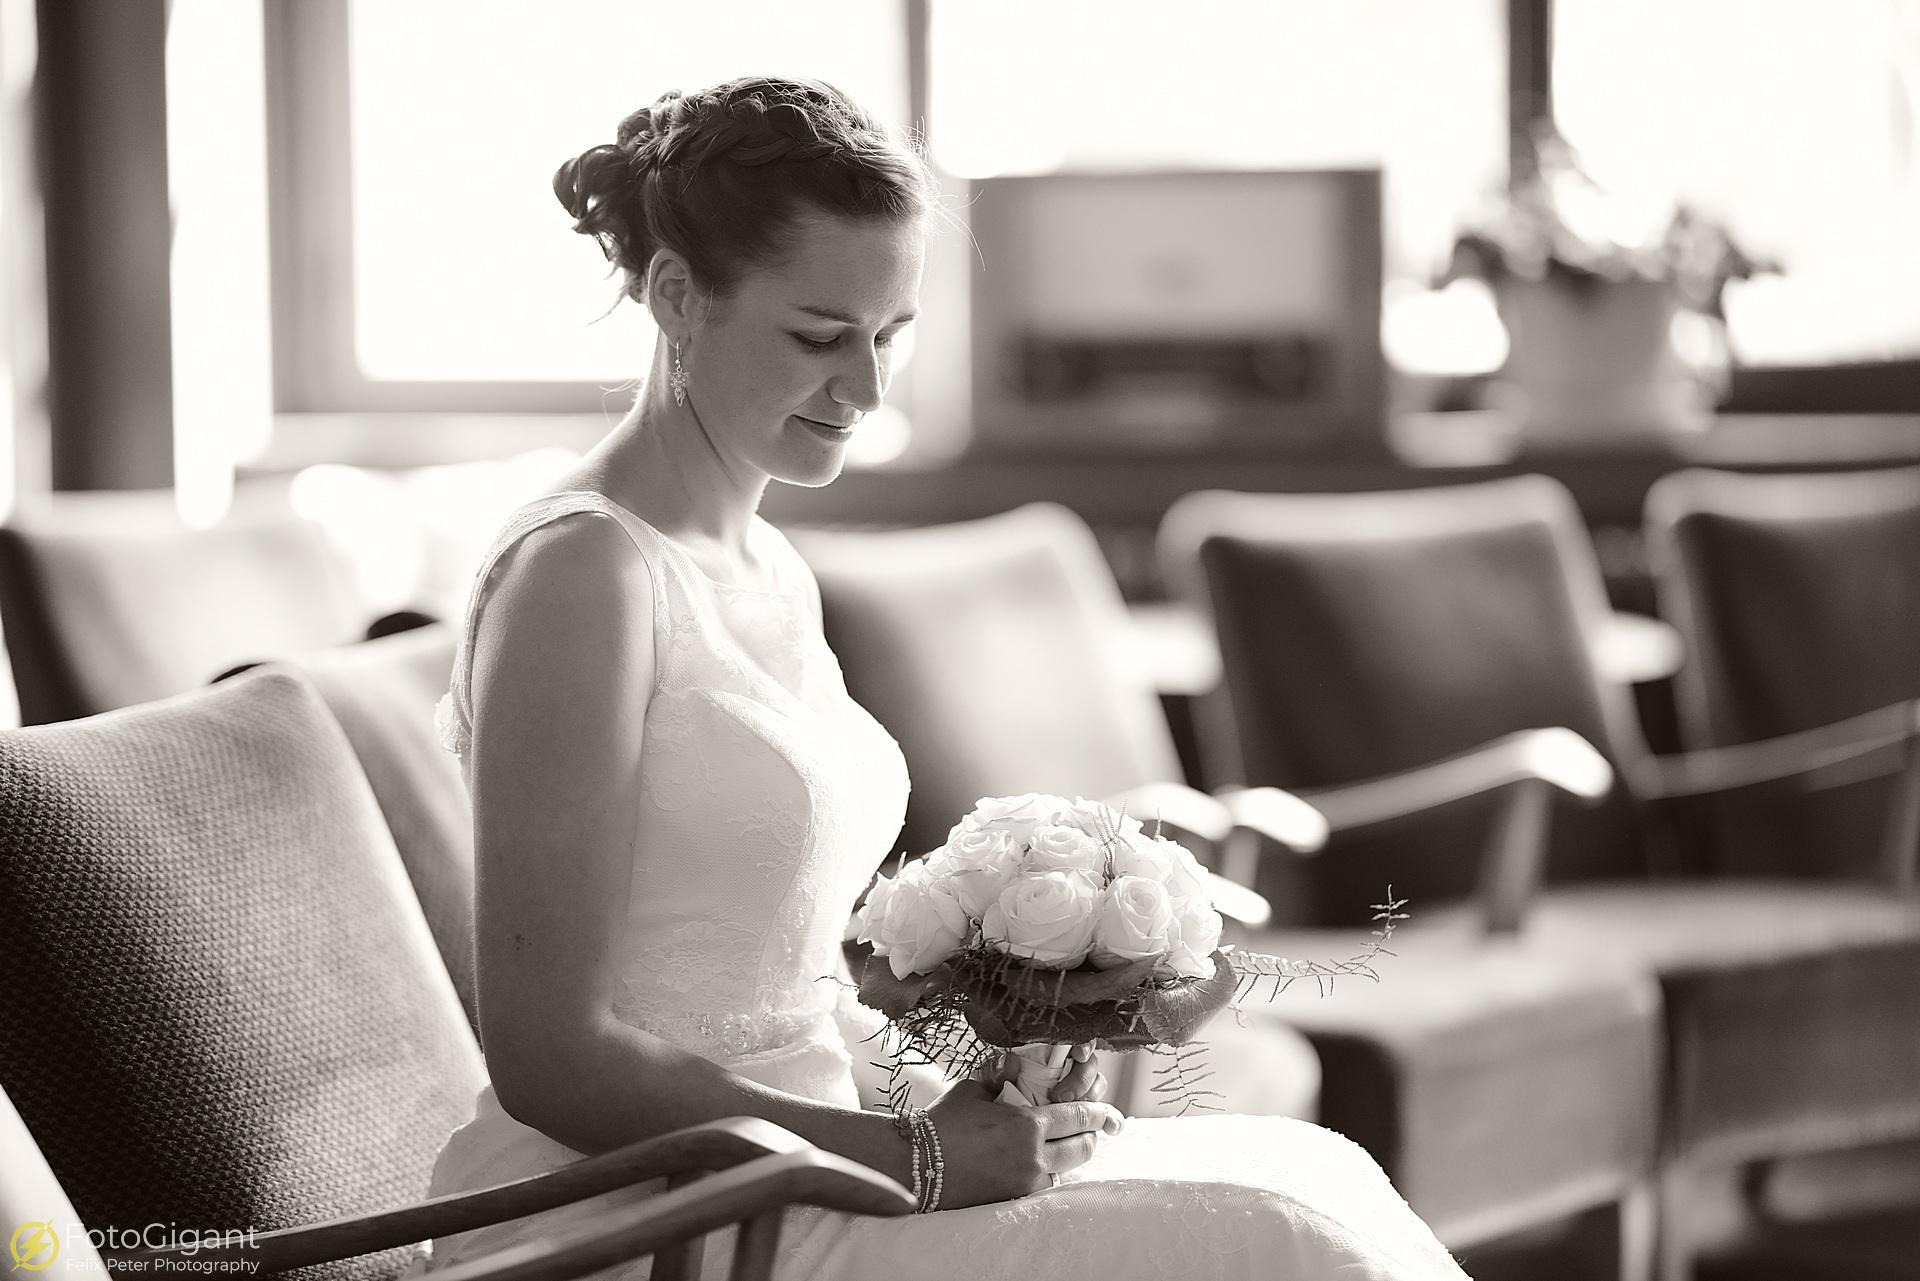 Hochzeitsfotografiekurs_Fotograf_Felix_Peter_32.jpg